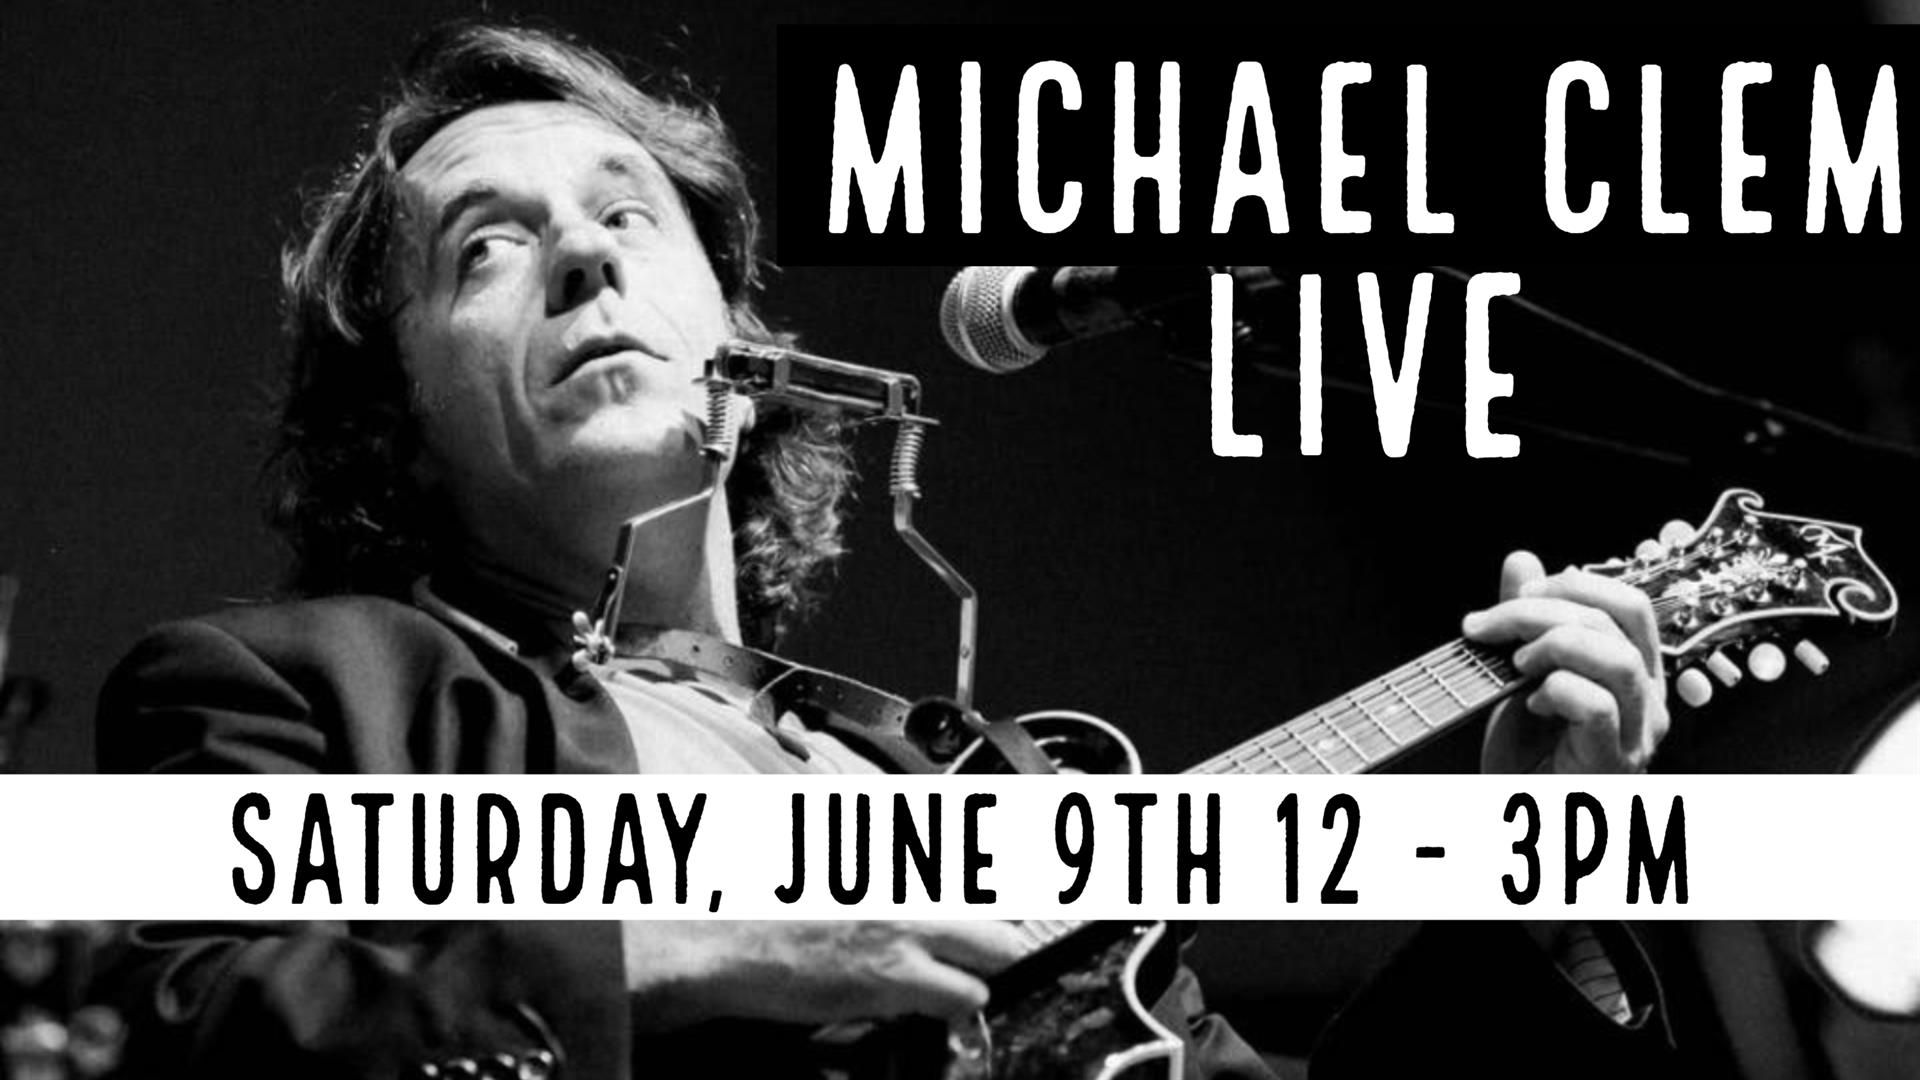 Michael Clem Saturday June 9th